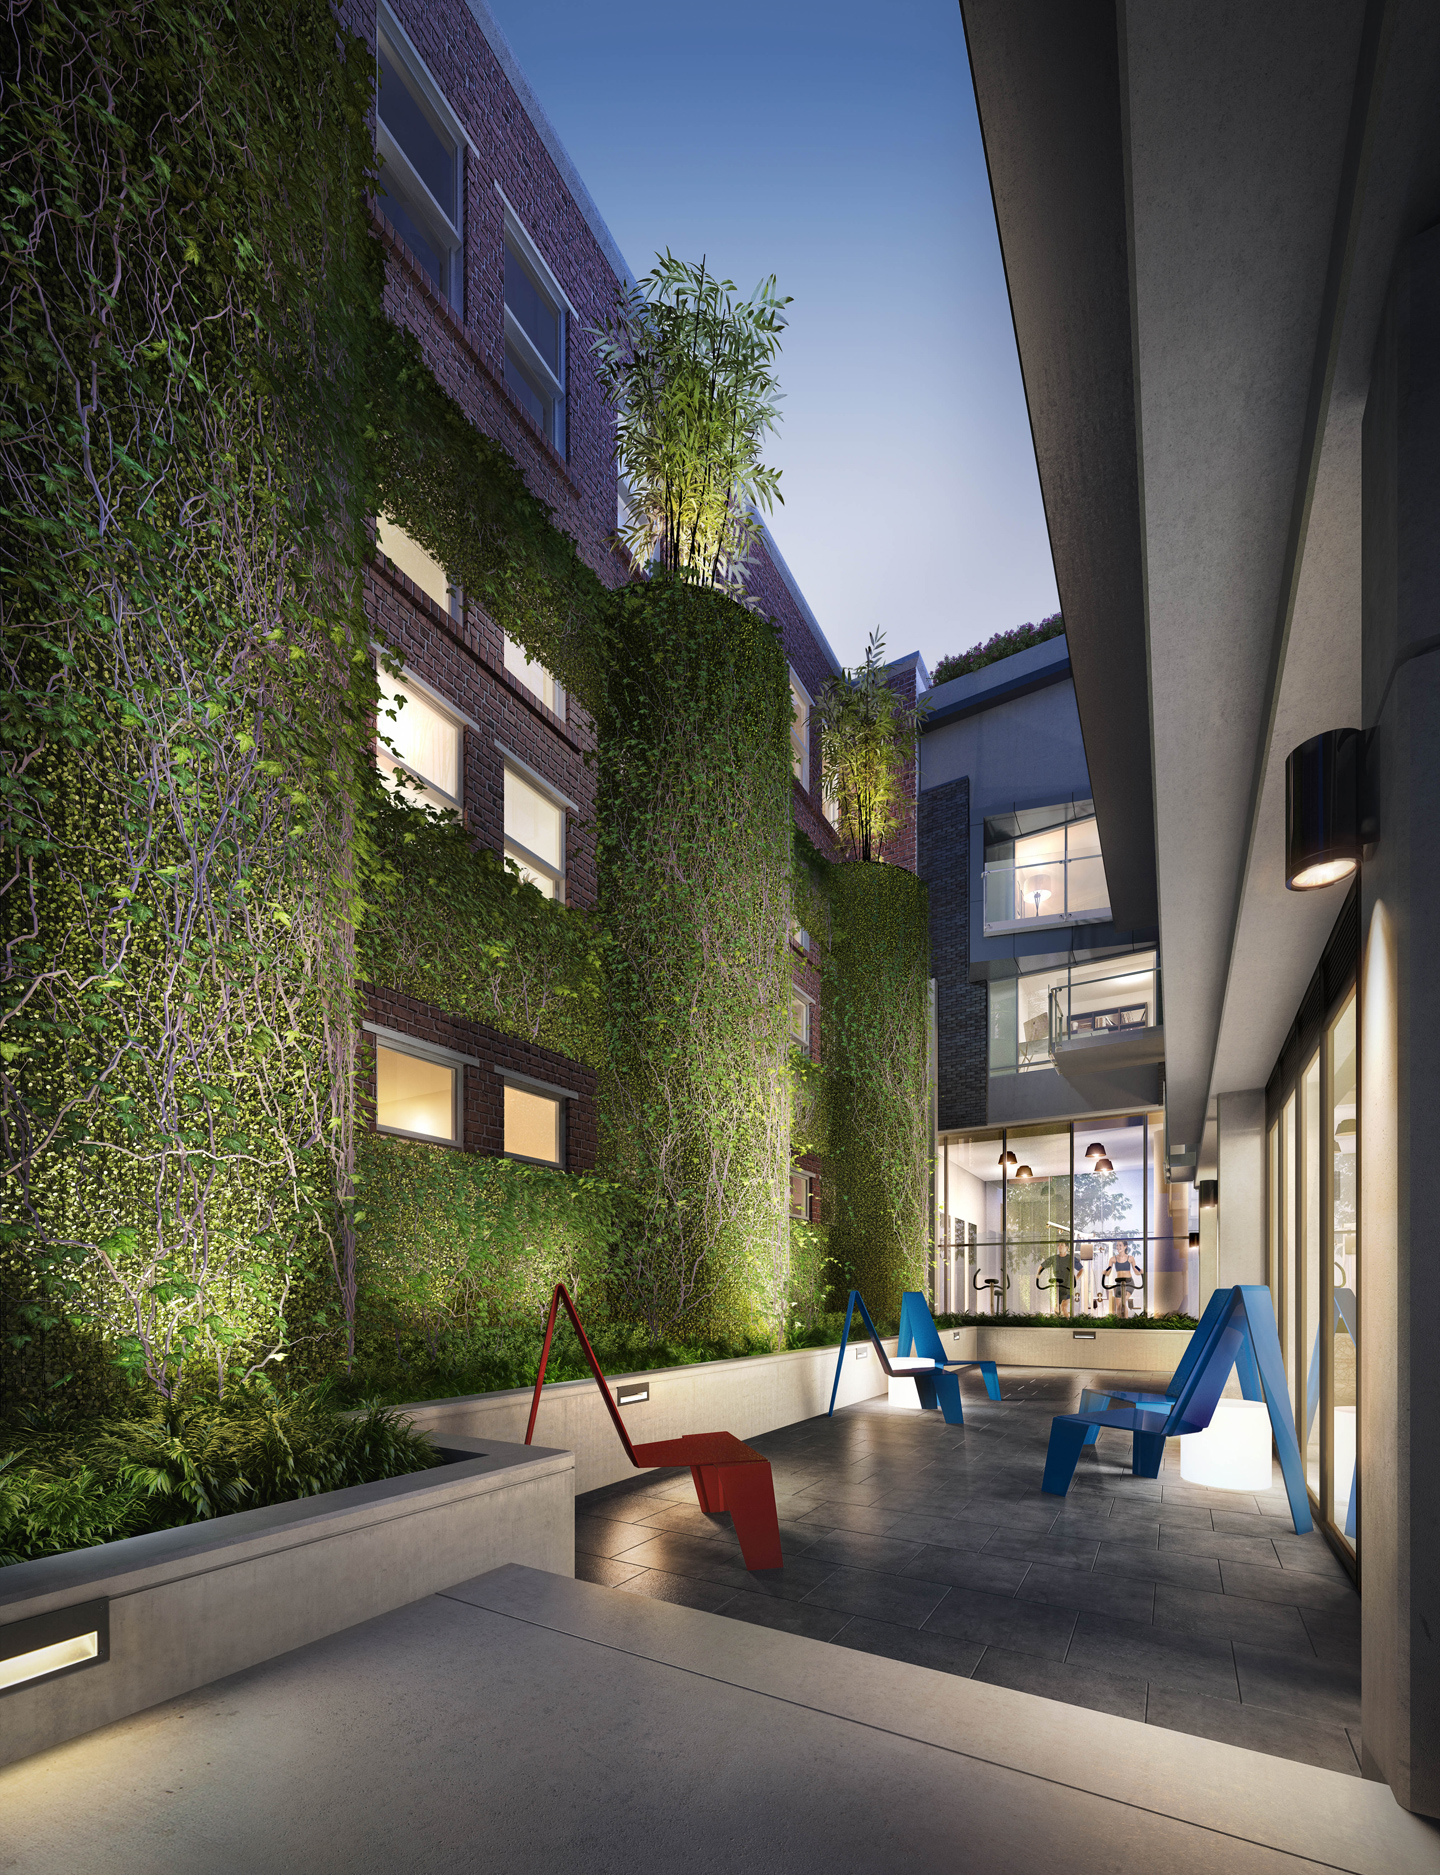 Addition-patio-lg.jpg